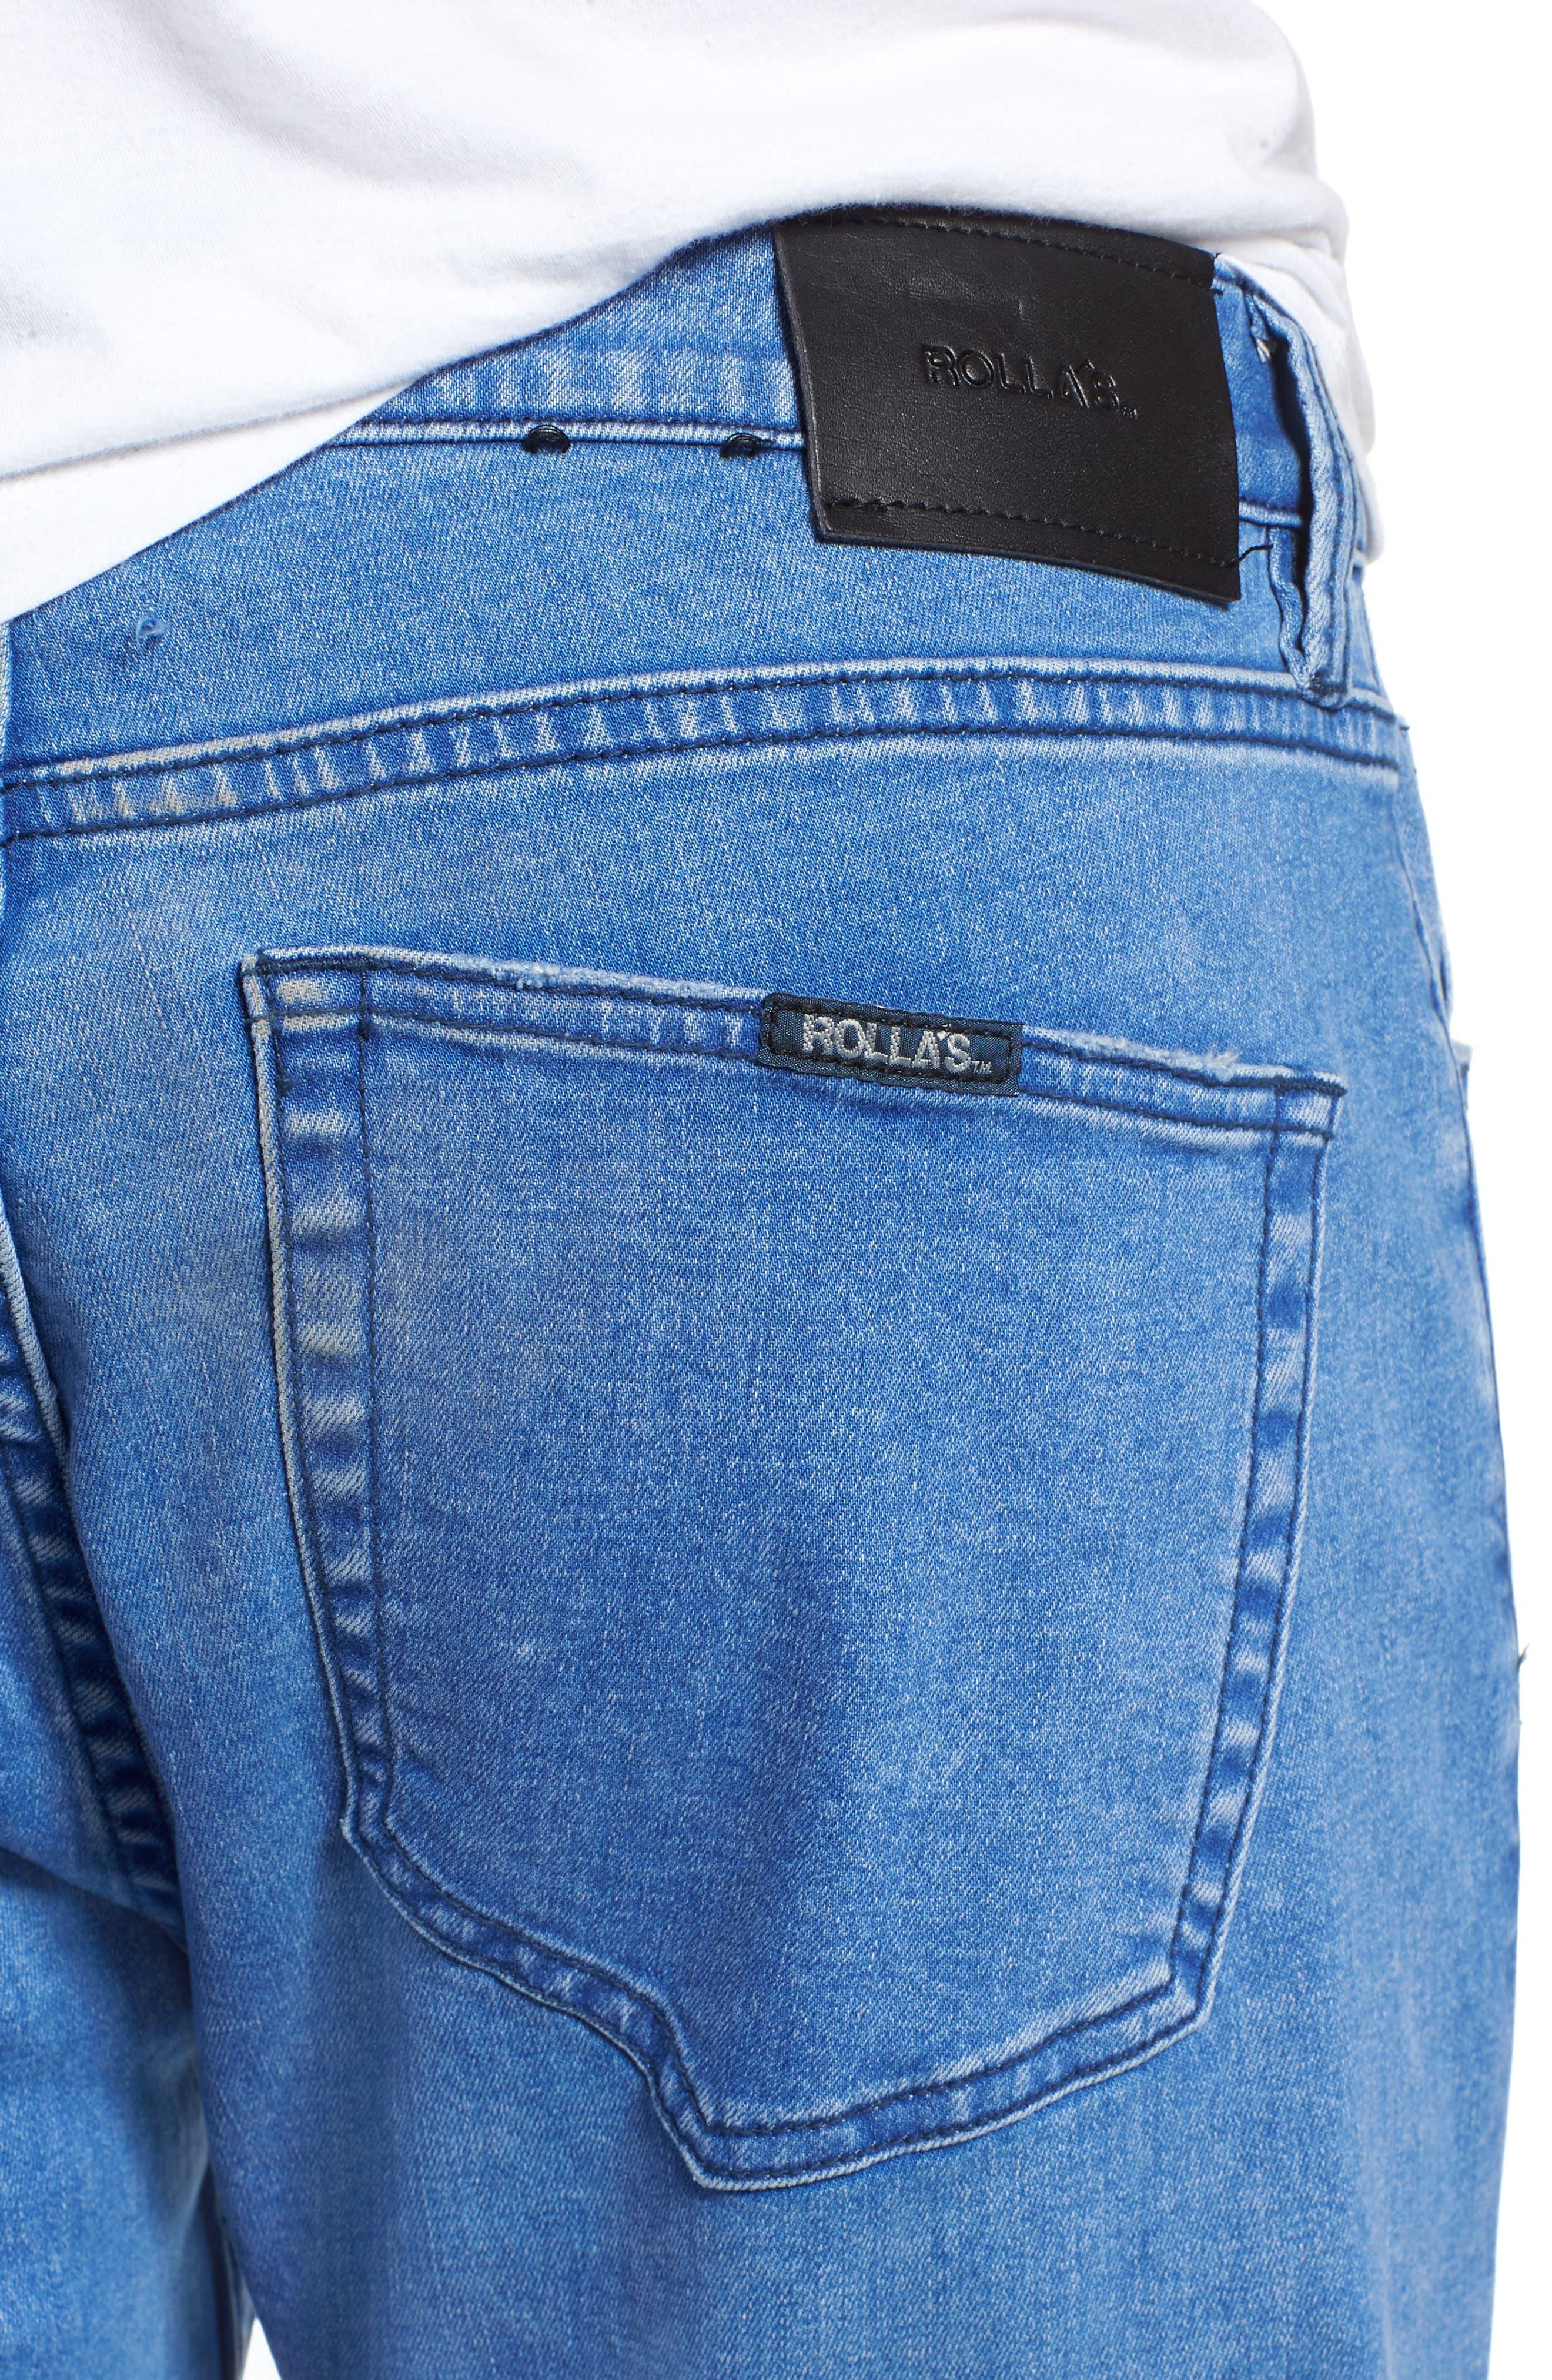 Rollies Slim Fit Jeans,                             Alternate thumbnail 4, color,                             BOLD BLUE